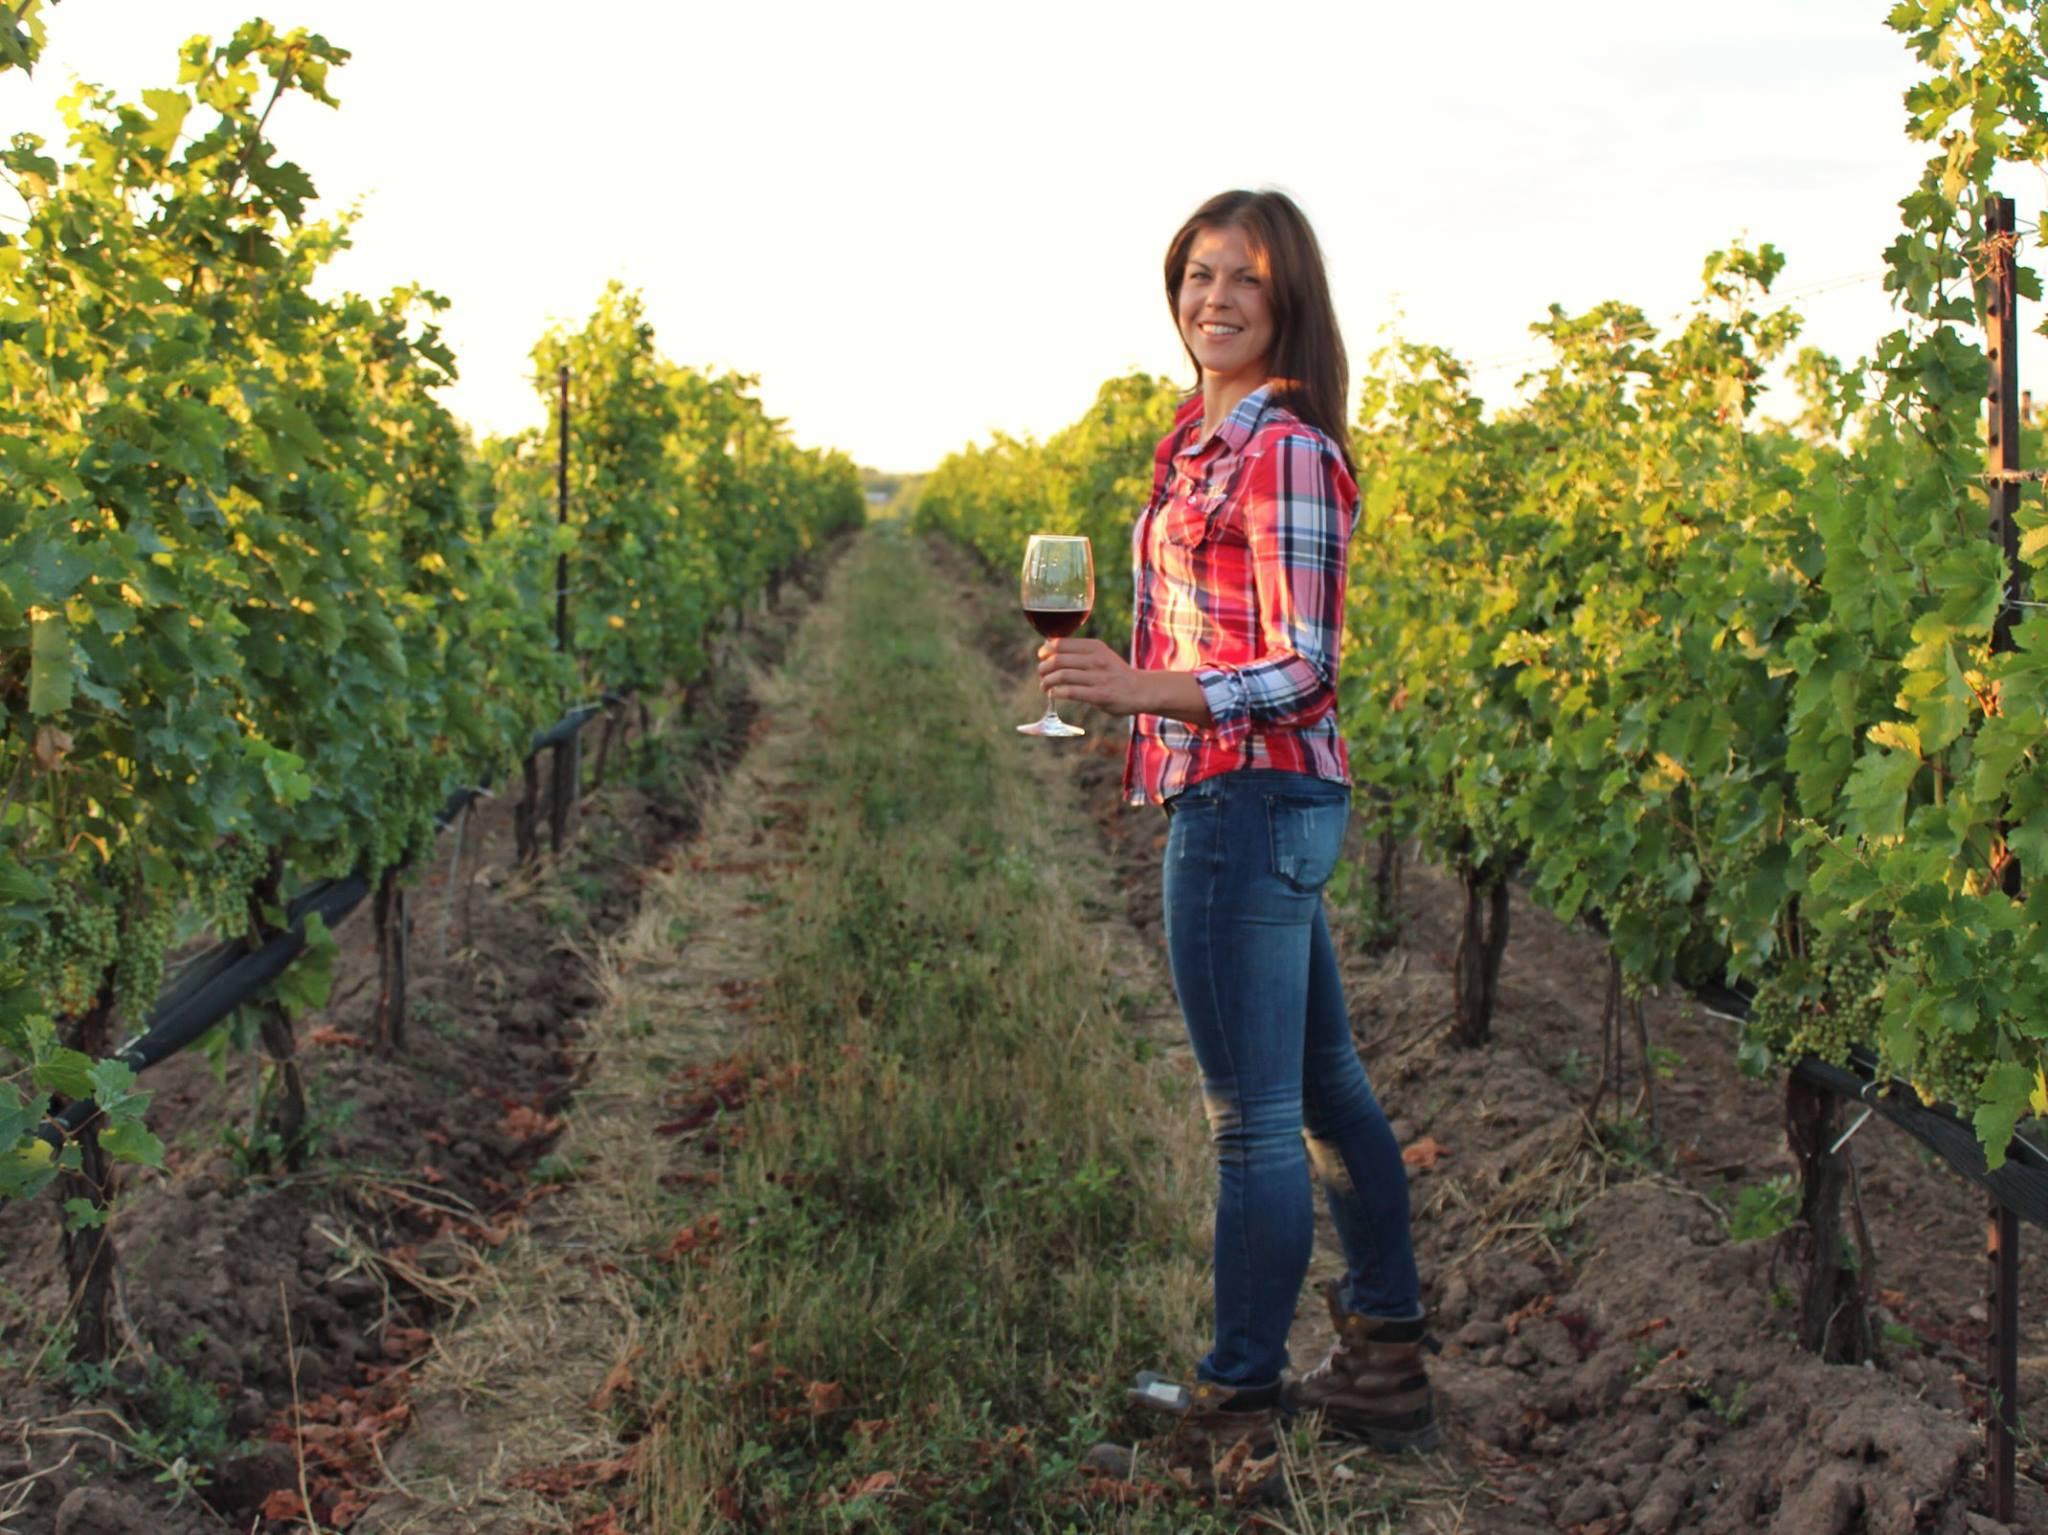 Burning Kiln Winery Appoints Head Winemaker Lydia Tomek Norfolk County Tourism